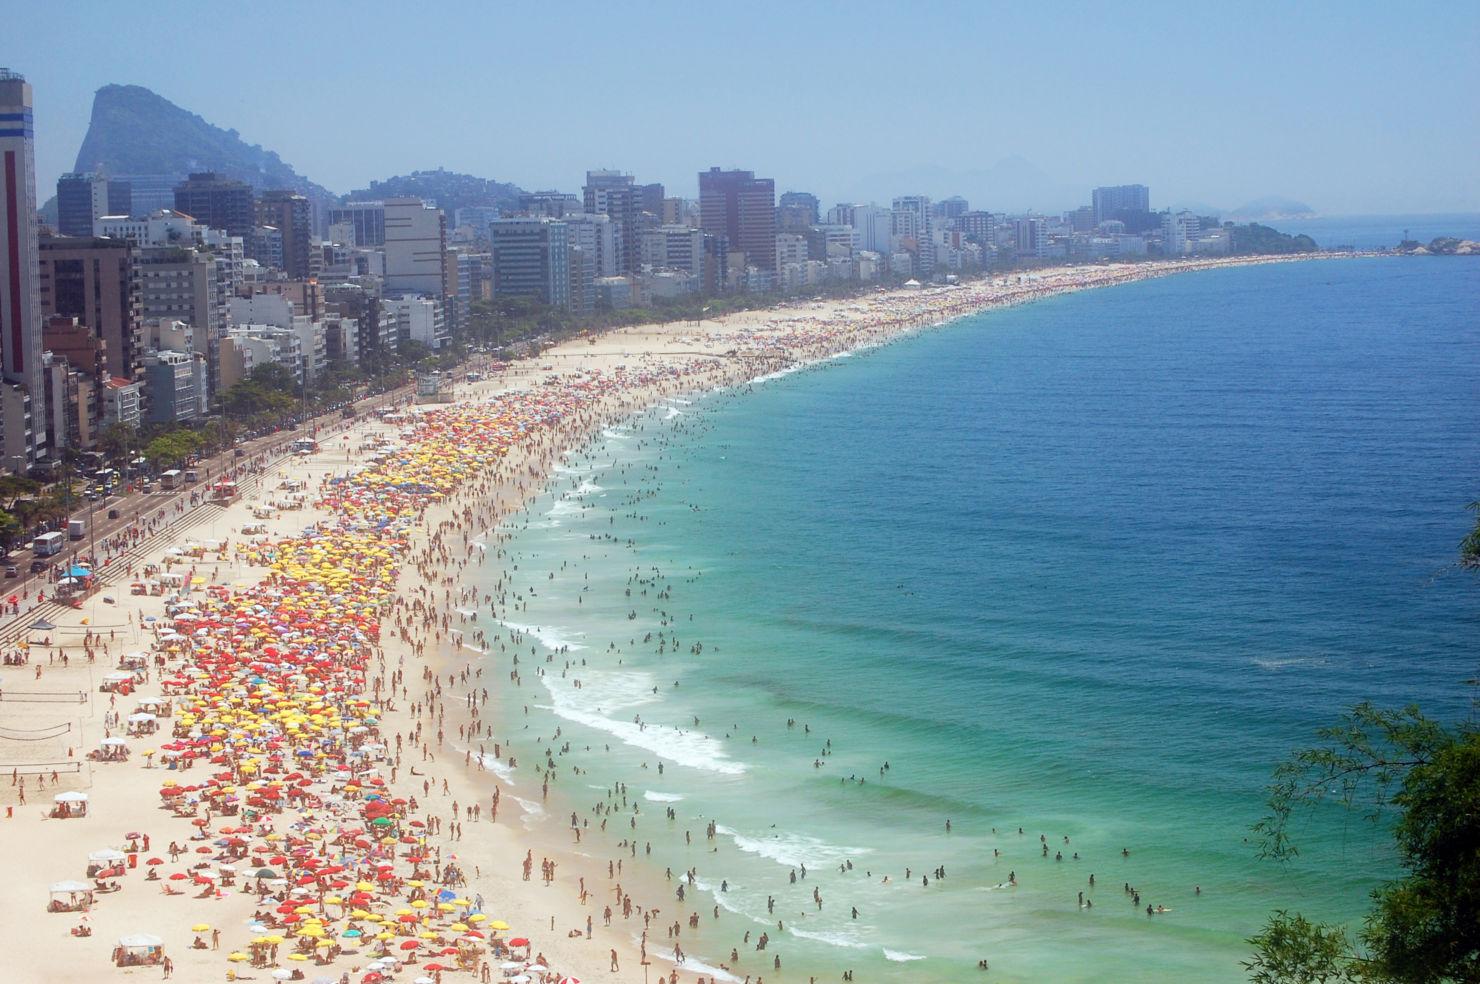 Ipanema and Leblon beach, Rio de Janeiro